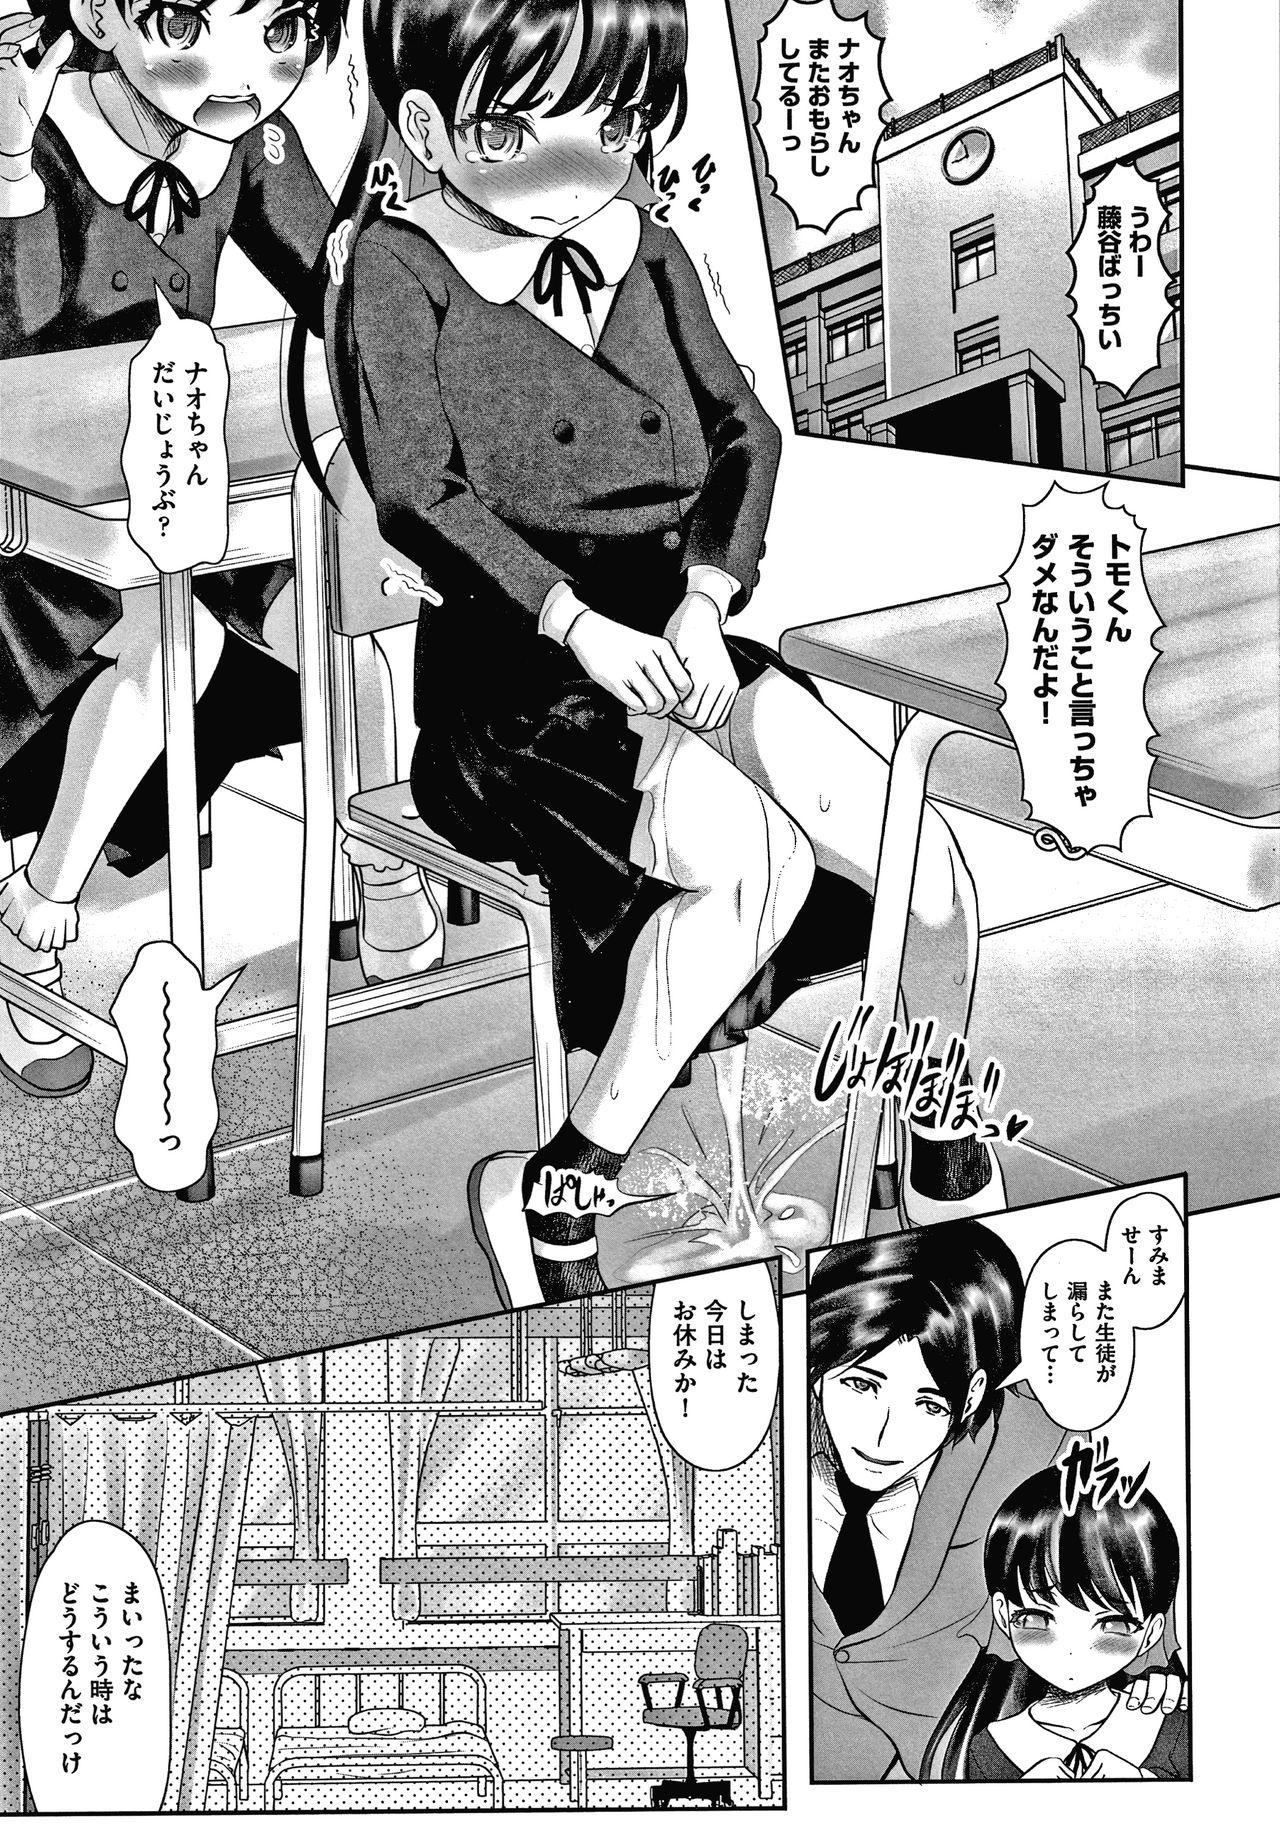 Shoujo Kumikyoku 15 129